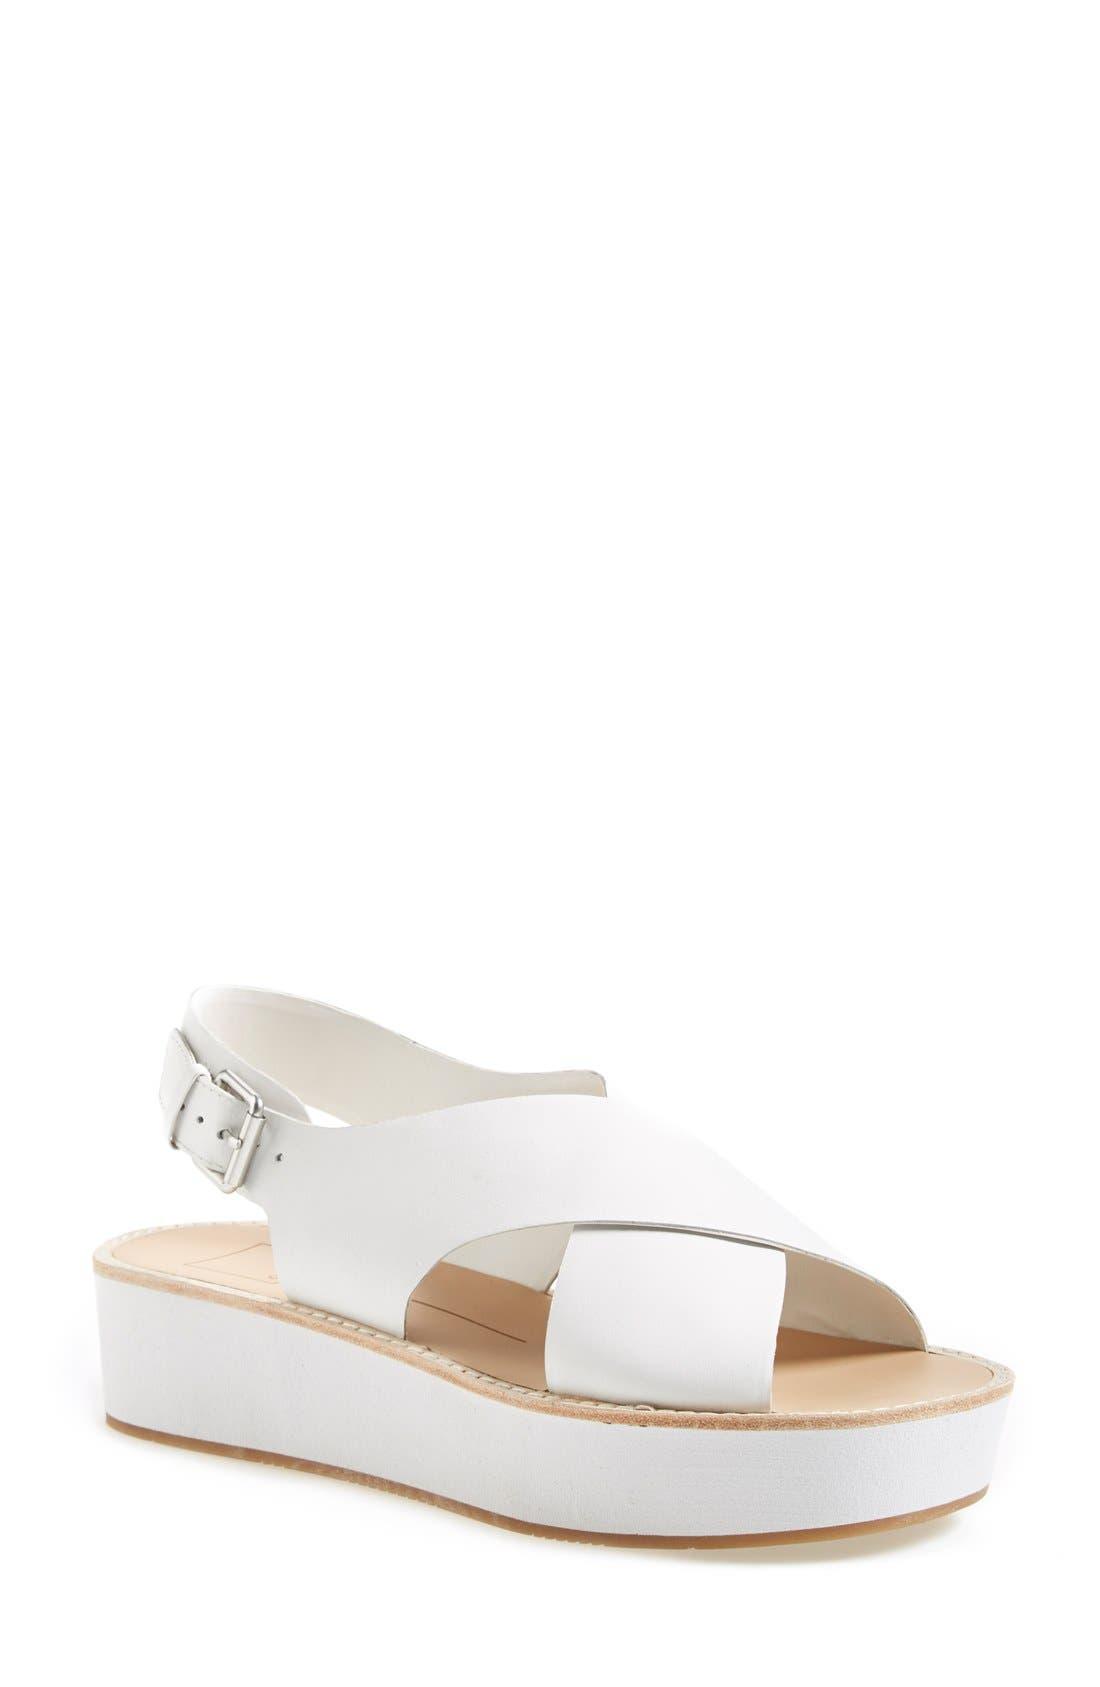 Alternate Image 1 Selected - Dolce Vita 'Ziggie' Sandal (Women)